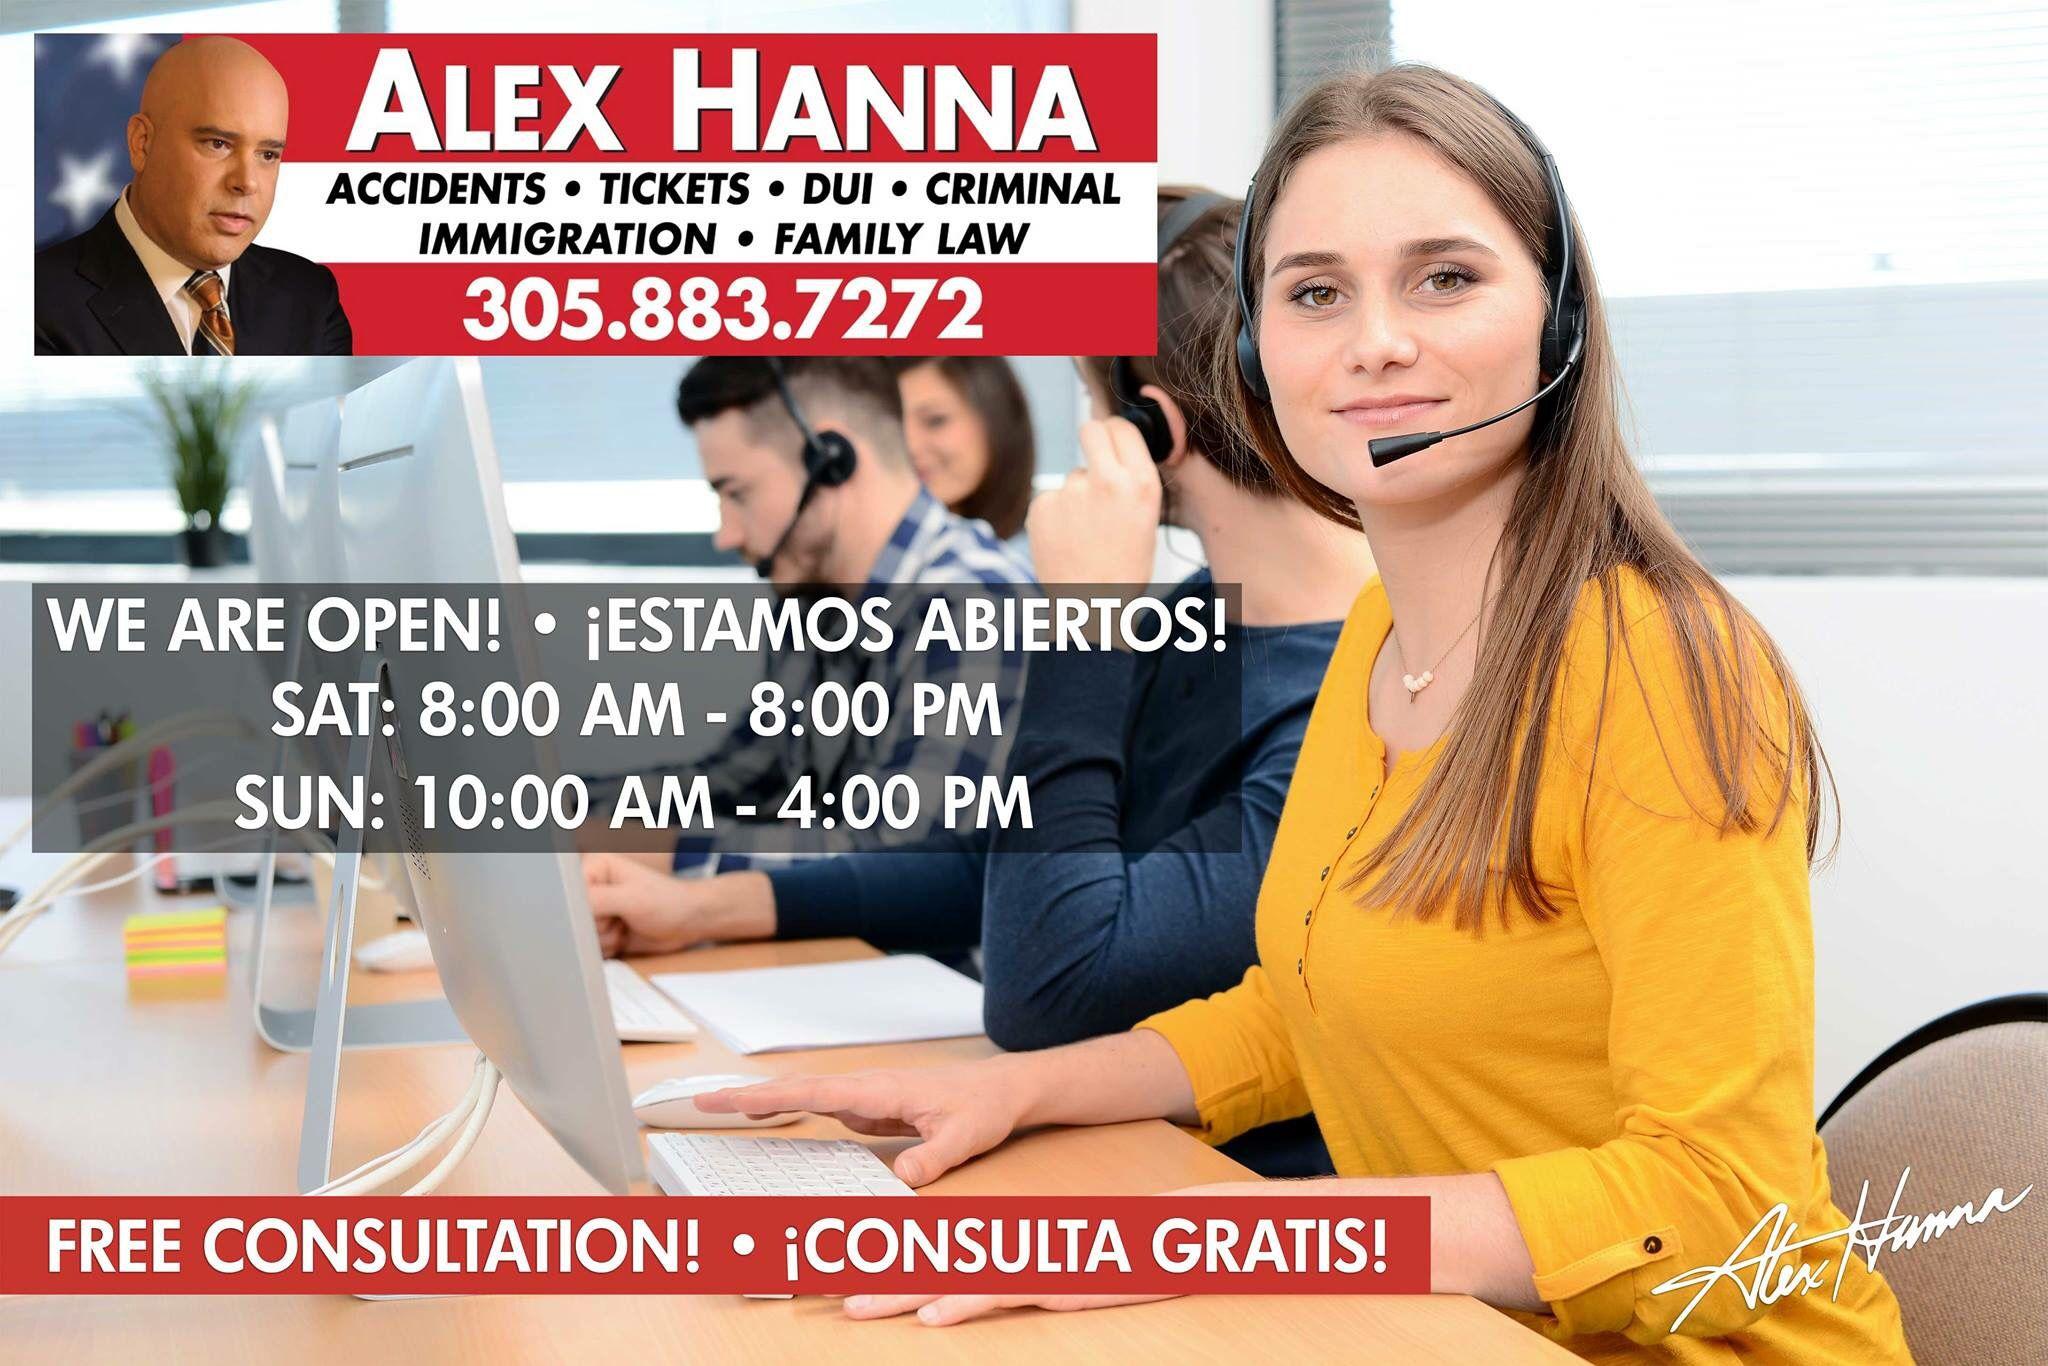 Need An Attorney Call Me Now For A Free Consultation 305 883 7272 We Are Open Until 8 Pm Necesita Un Abogado Alex Hanna Criminal